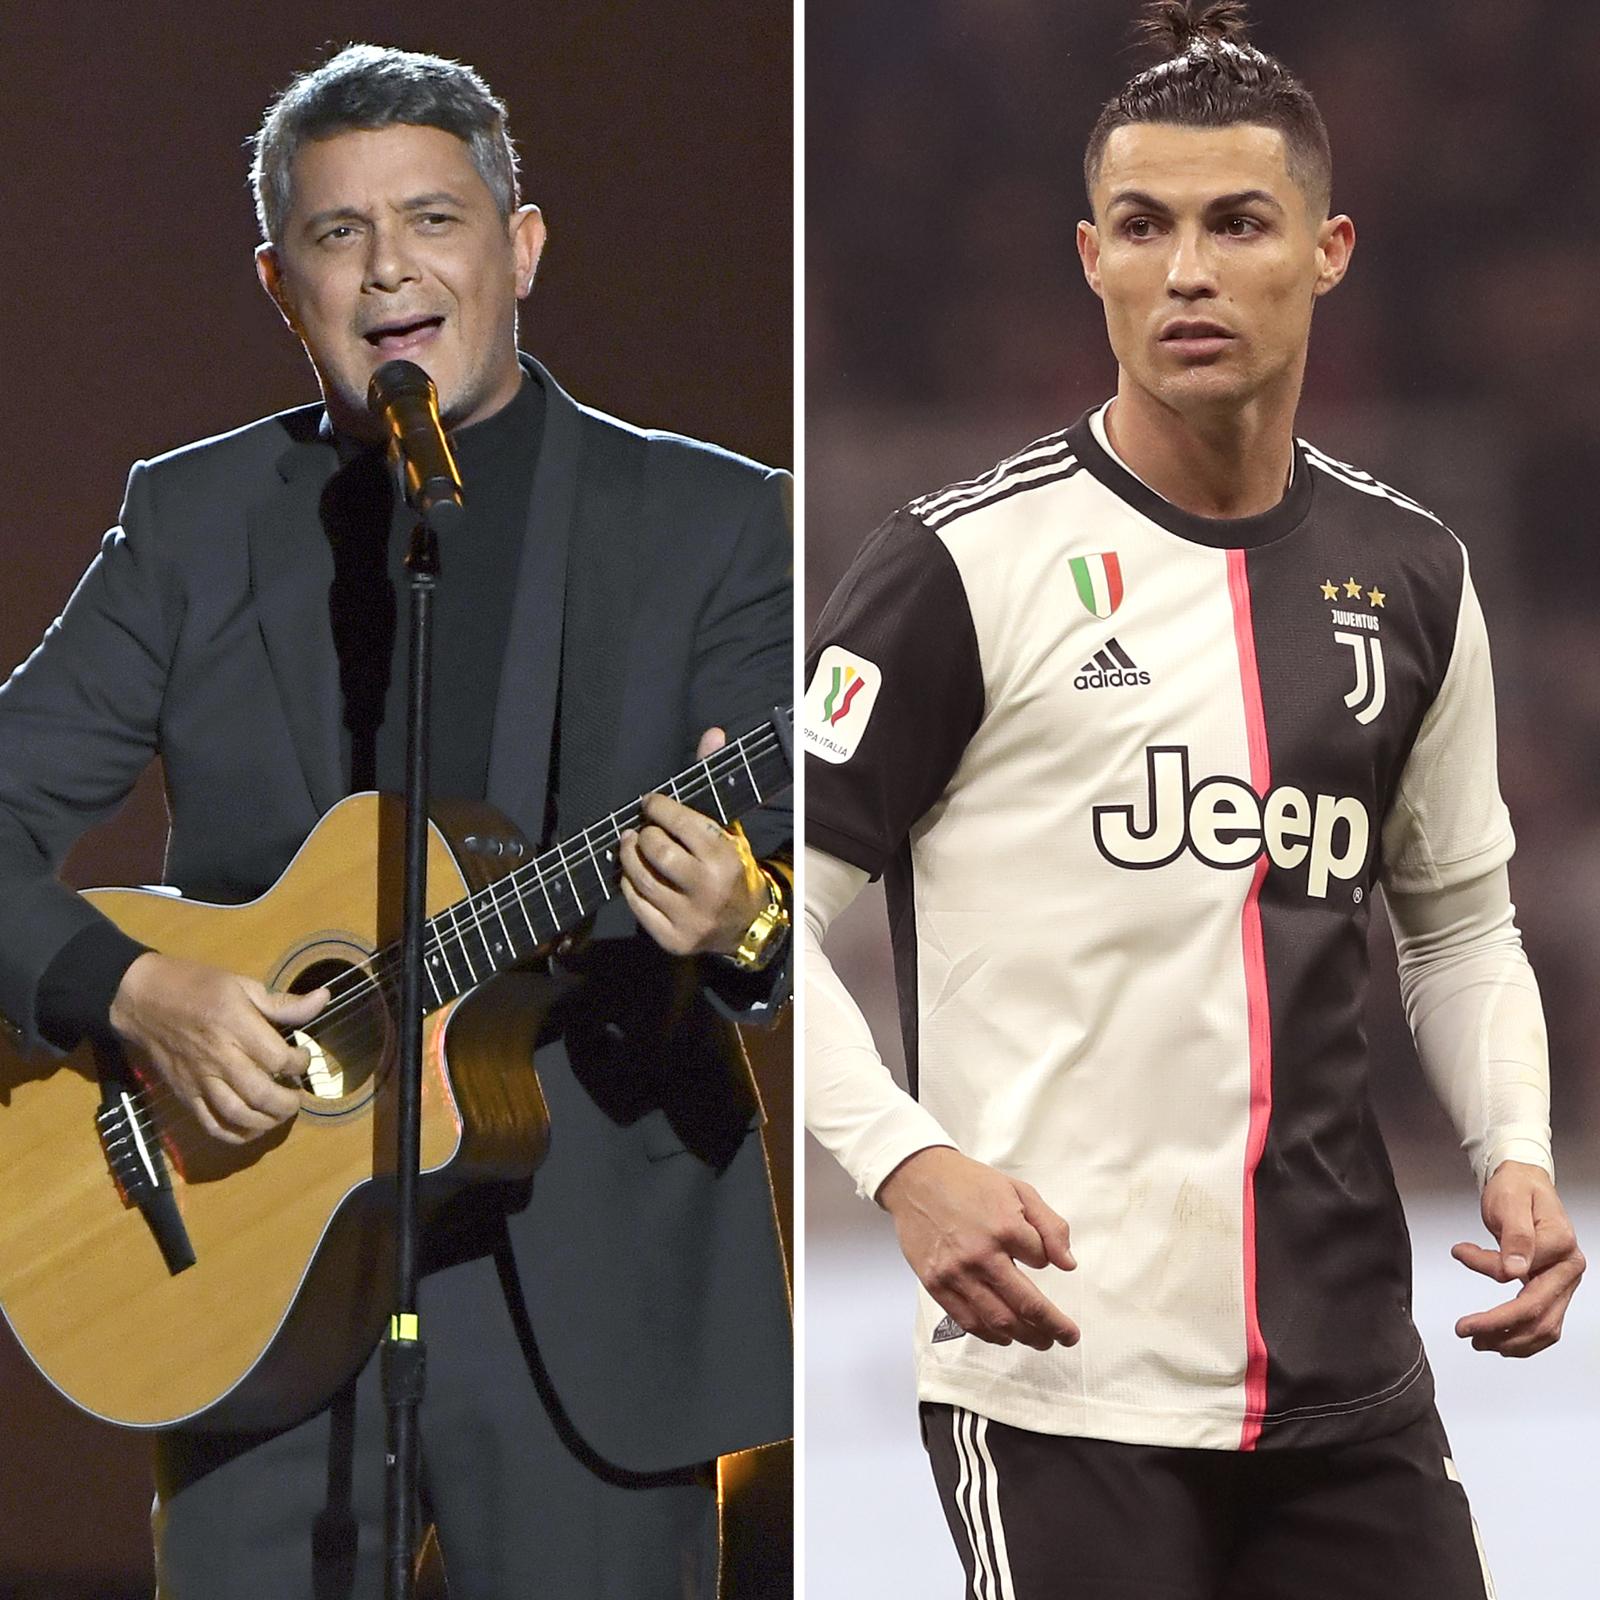 Alejandro Sanz y Cristiano Ronaldo